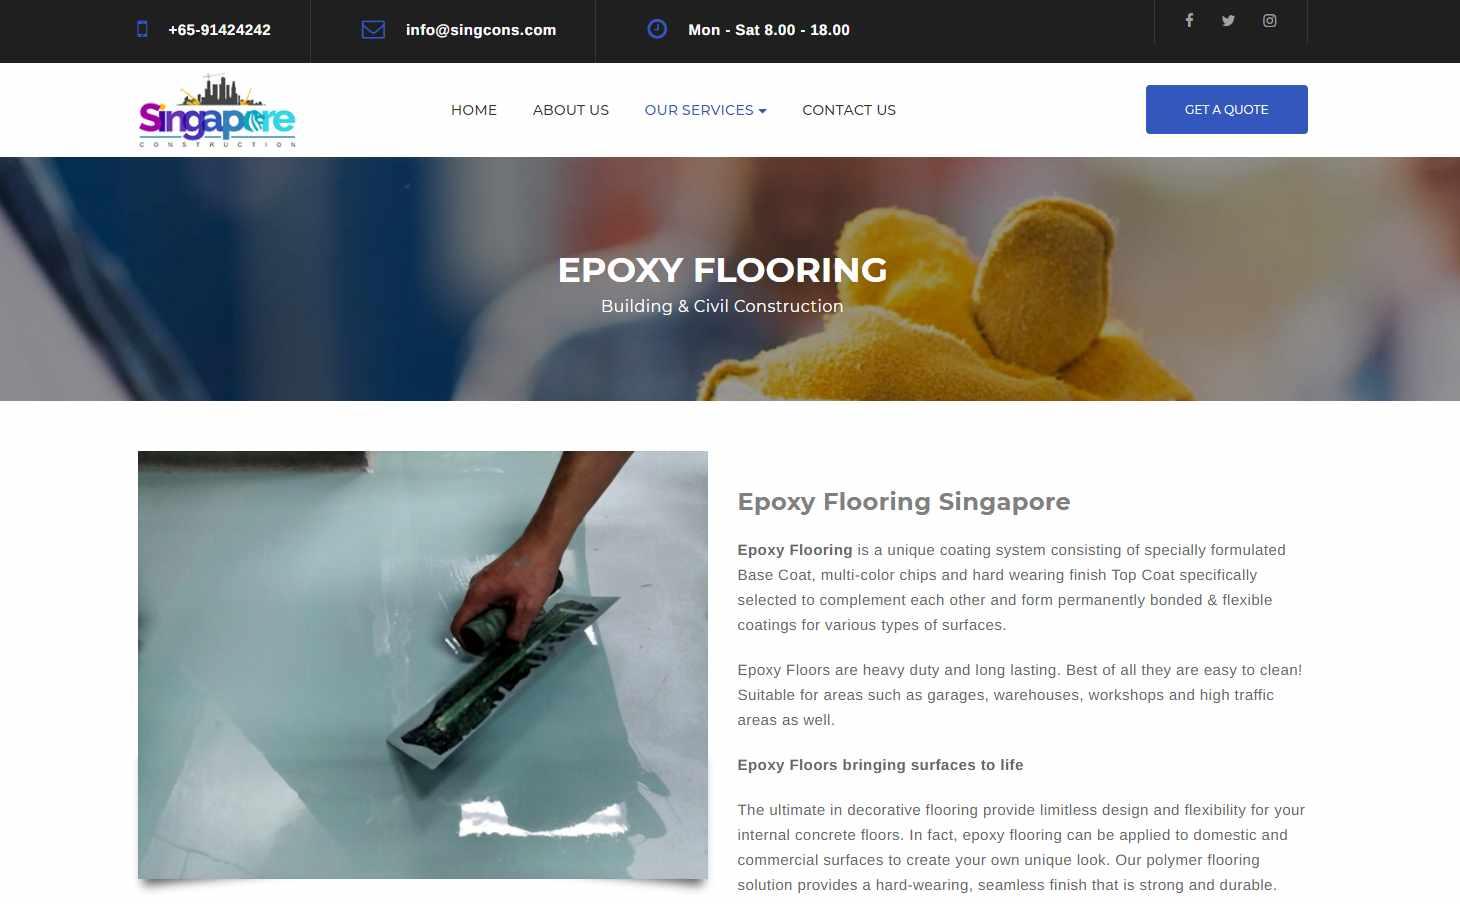 singcons Top Epoxy Flooring Provider in Singapore